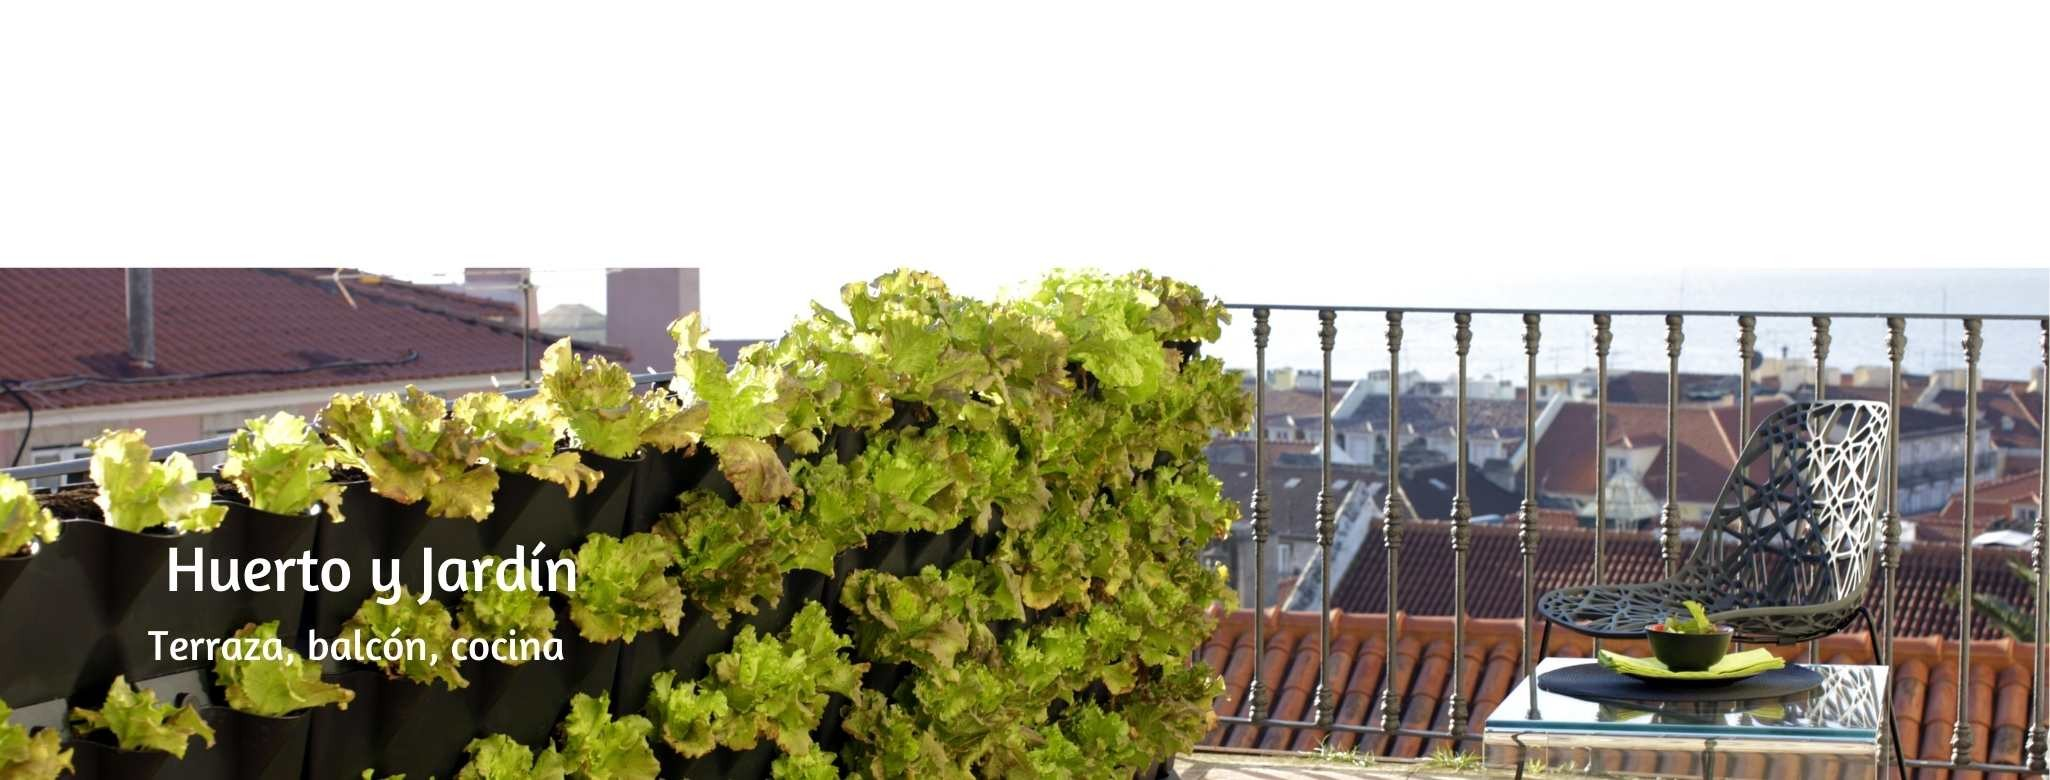 Fresanas®: Huerto & Jardín -